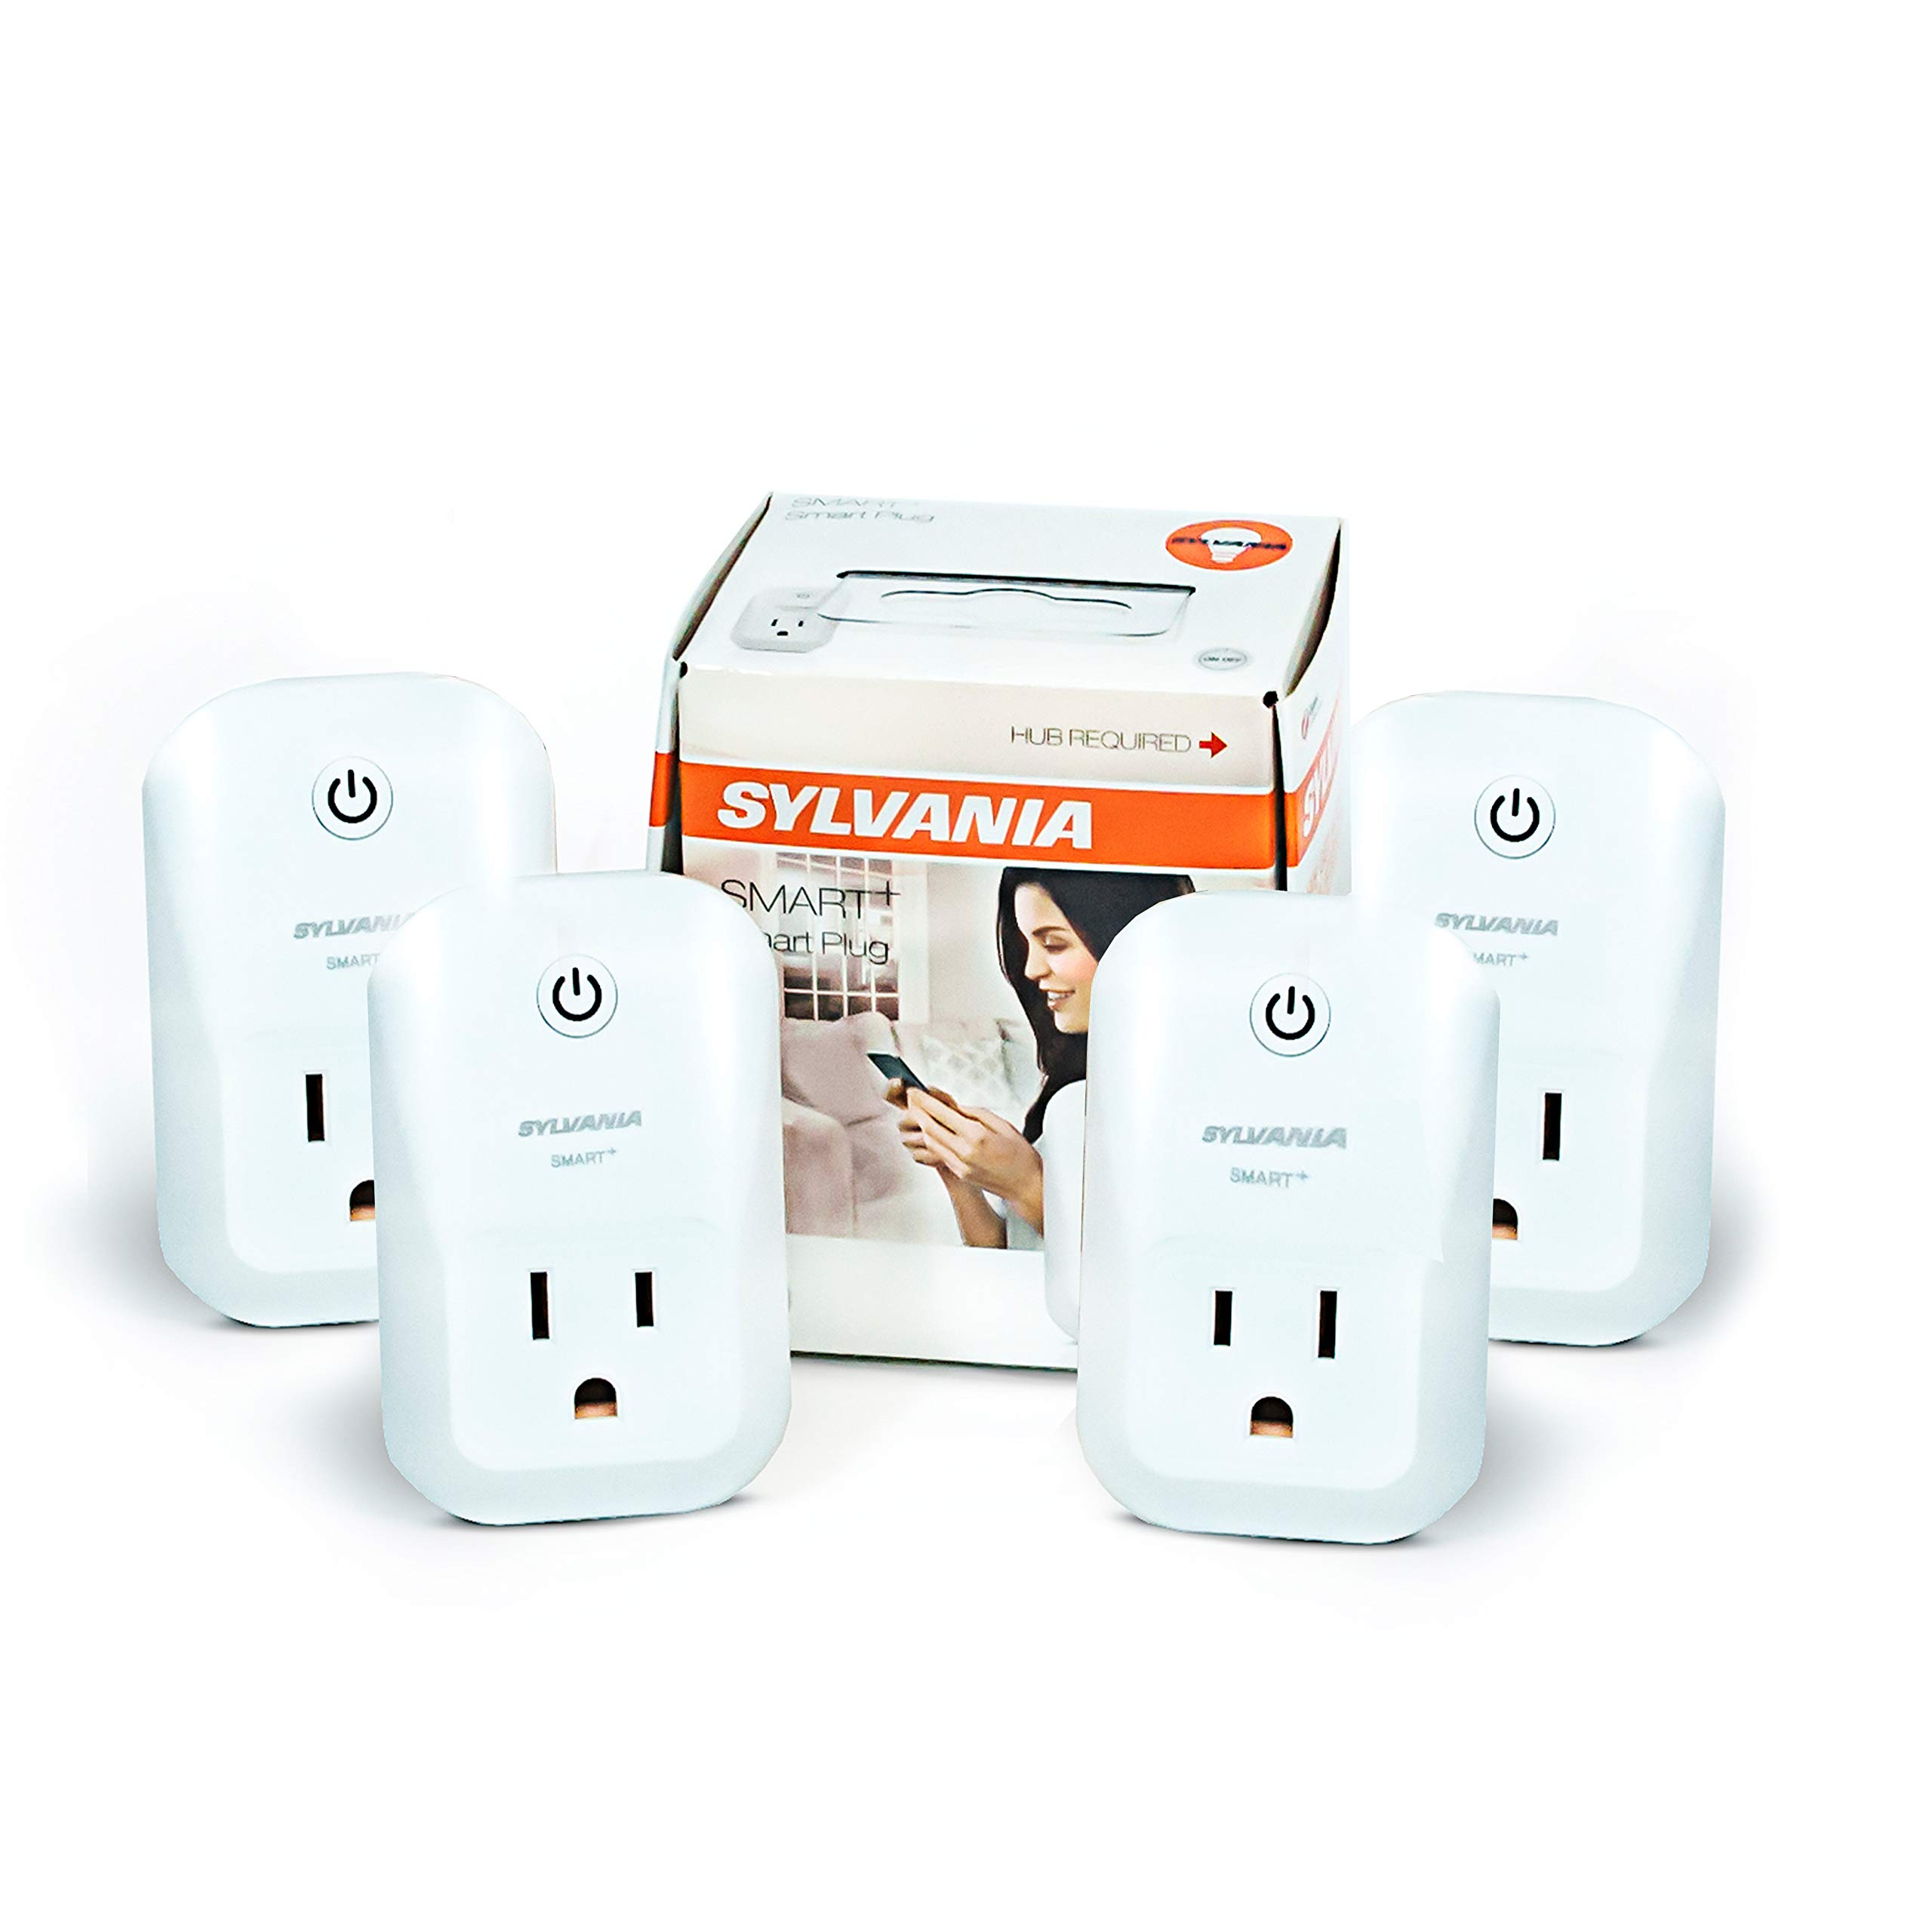 Sylvania 70555 ZigBee Indoor Smart Plug, Works with SmartThings, Wink, Echo Plus, Hub Needed for Amazon Alexa and The Google Assistant, 4 Pack